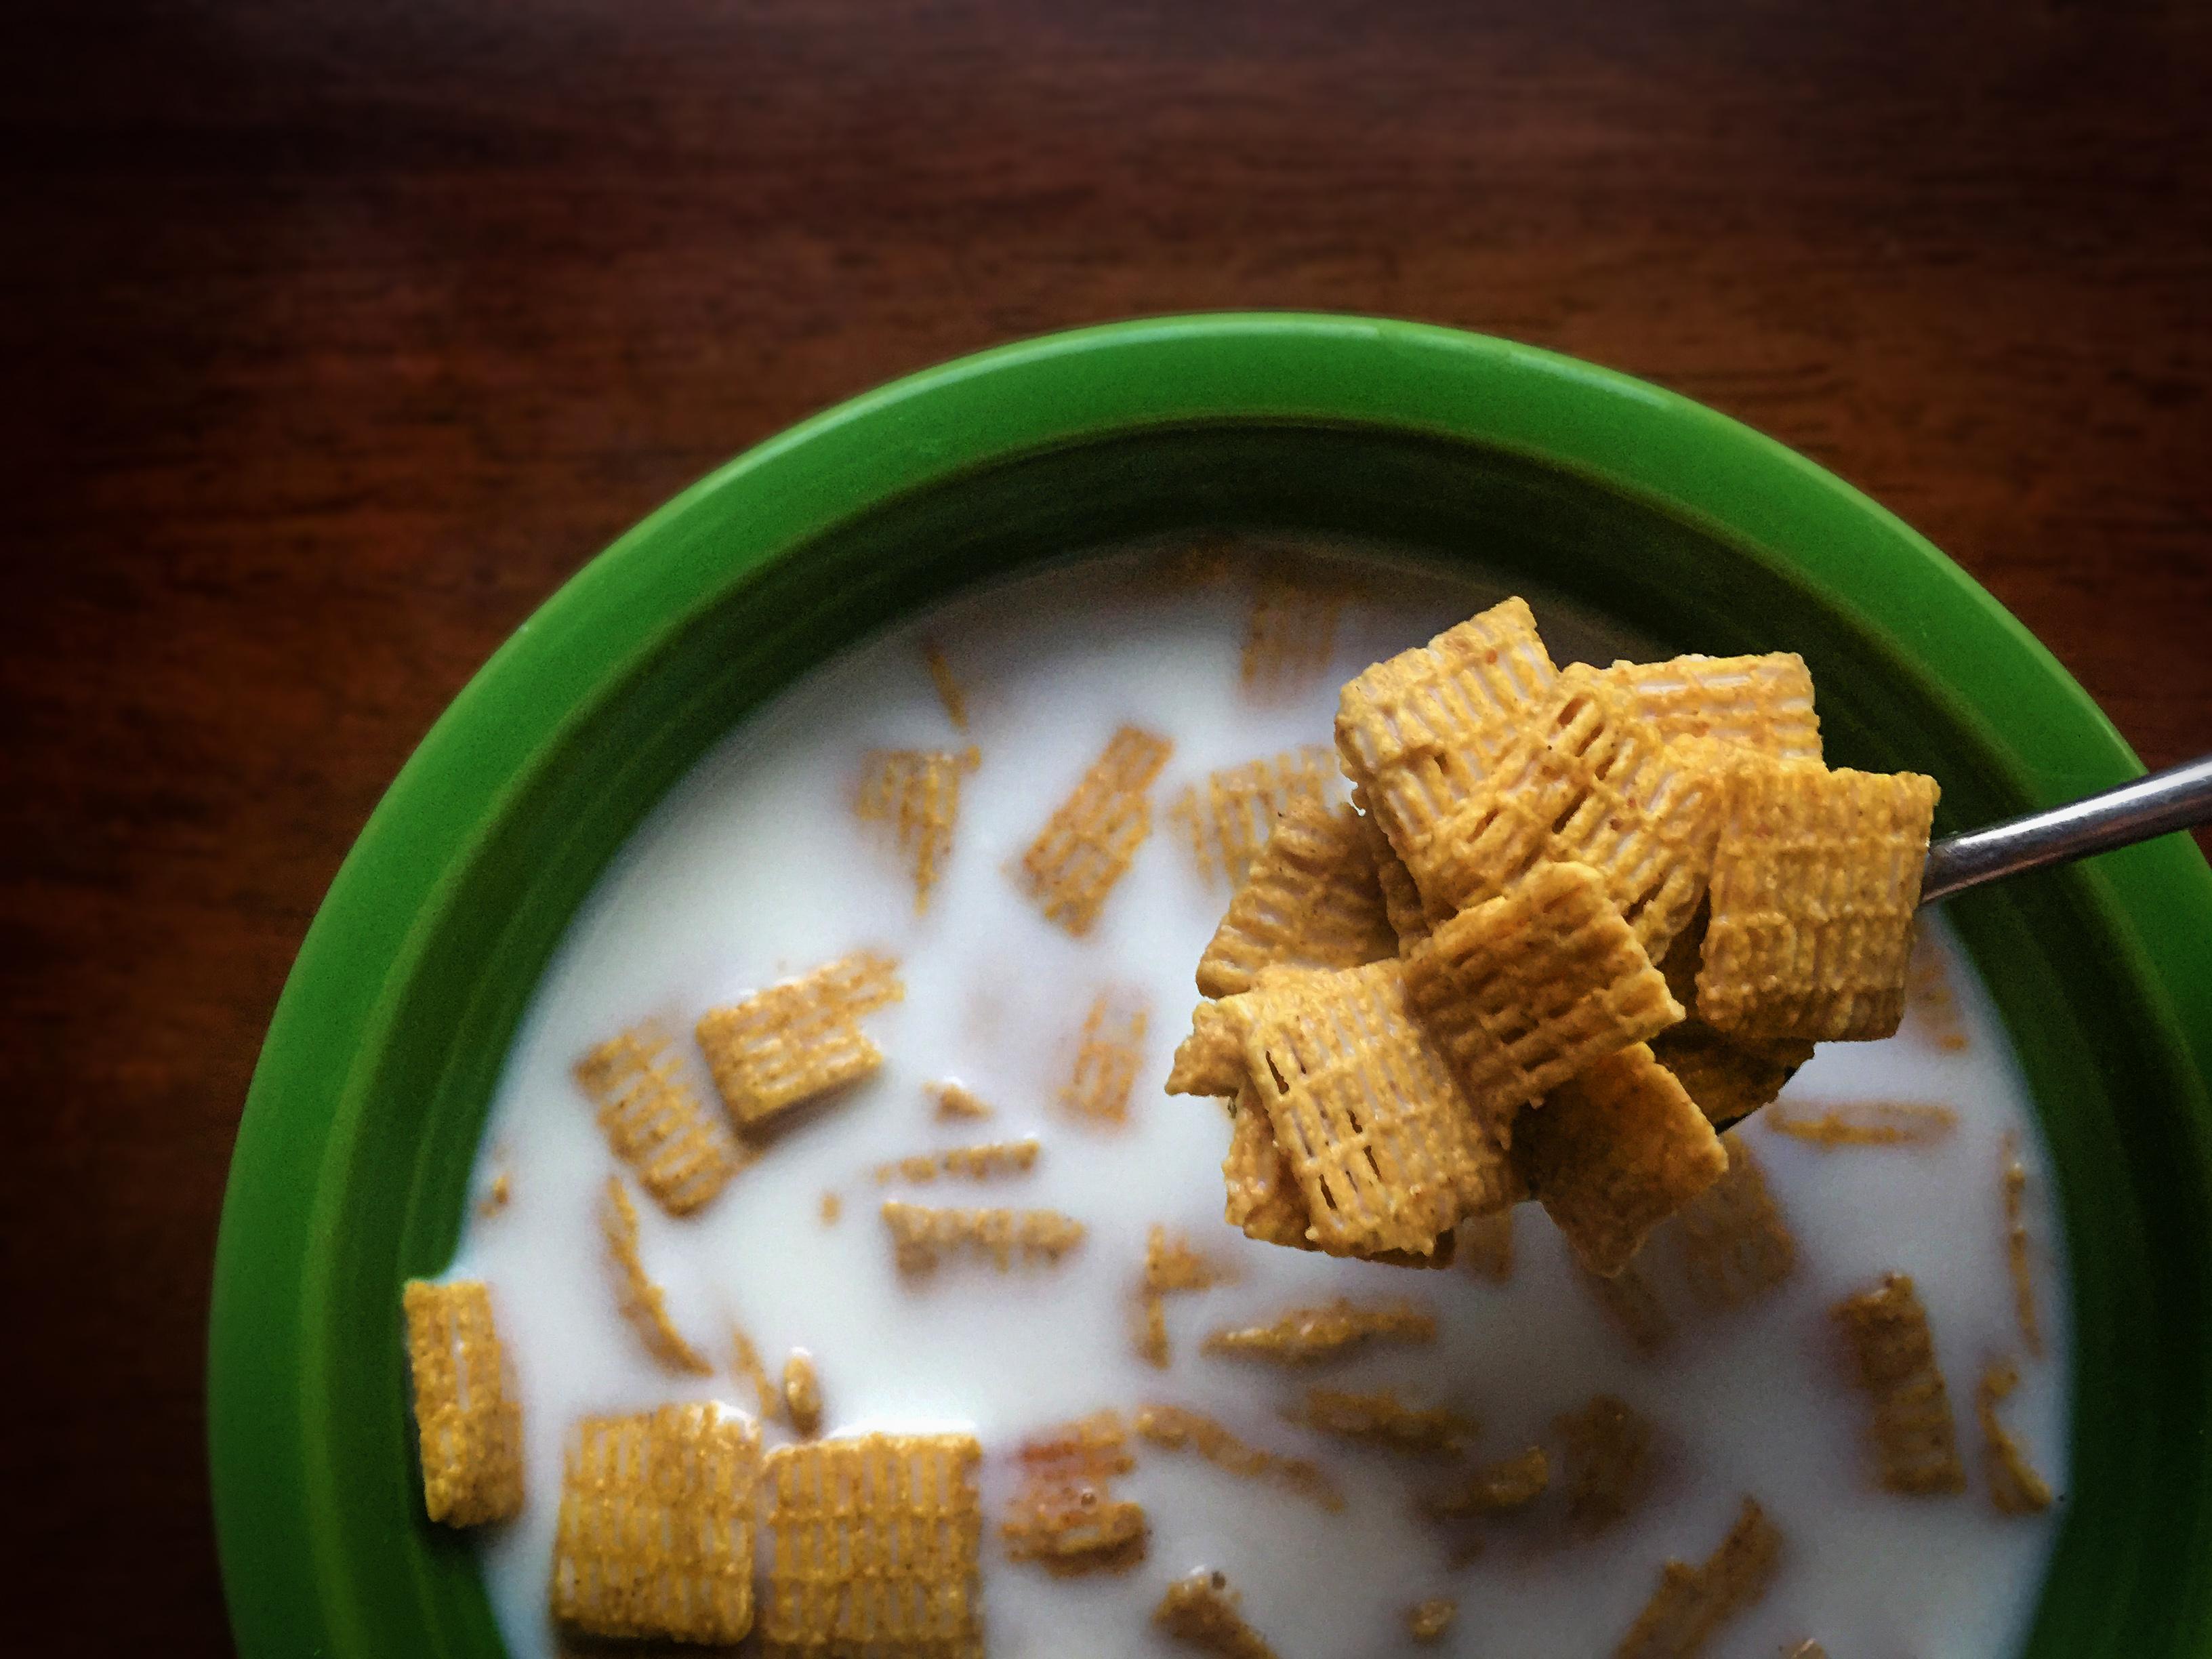 Shredded Cereal